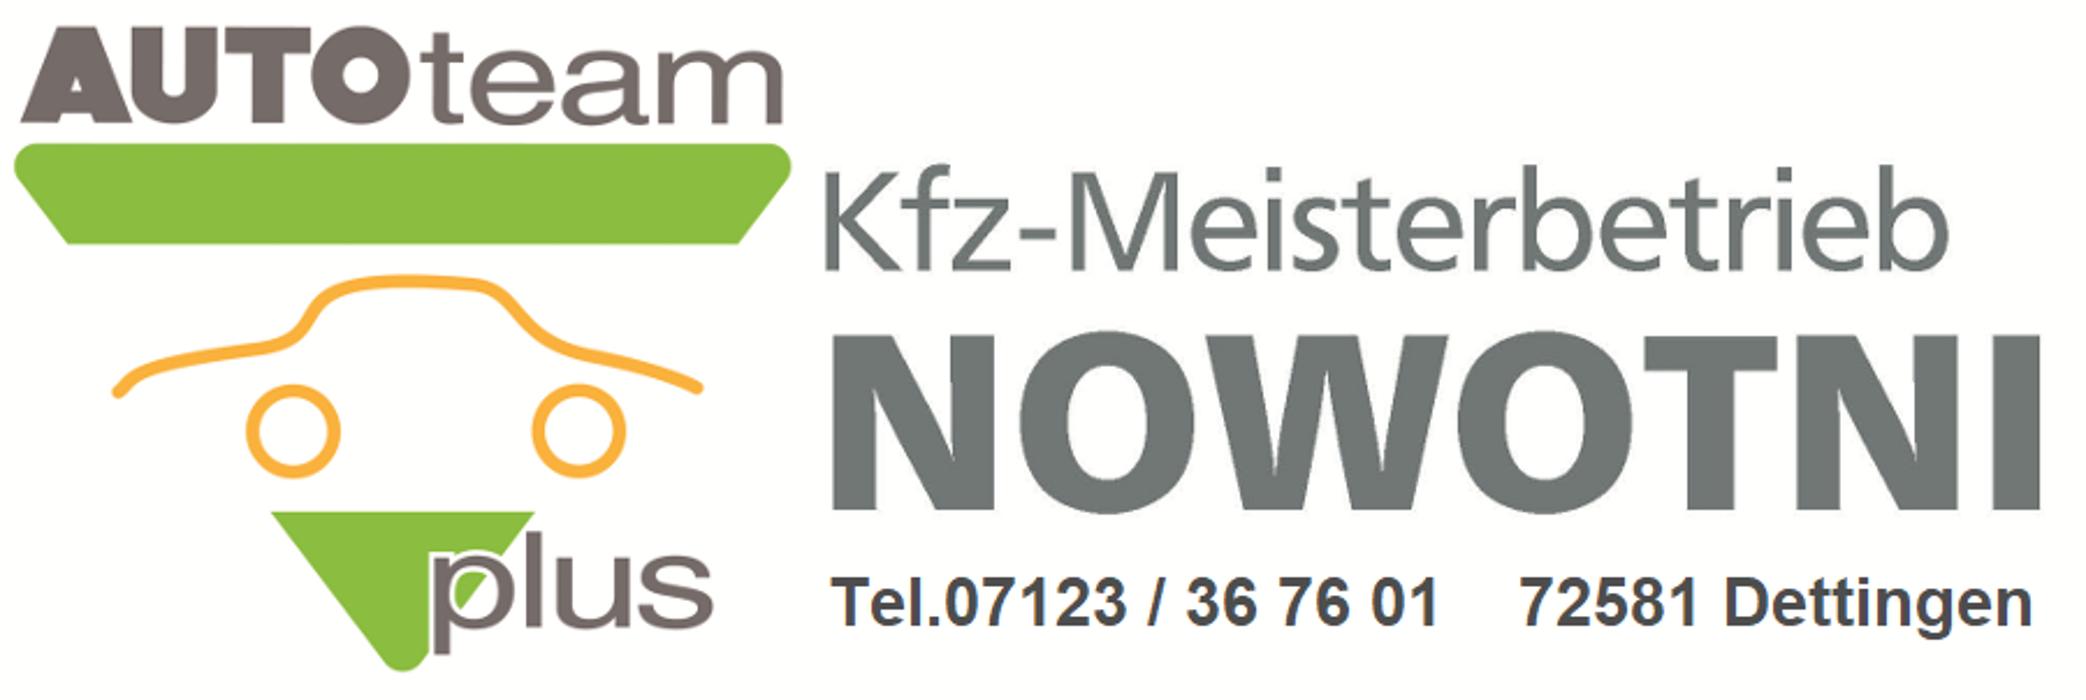 Bild zu Kfz-Meisterbetrieb Hildebrand in Augustdorf